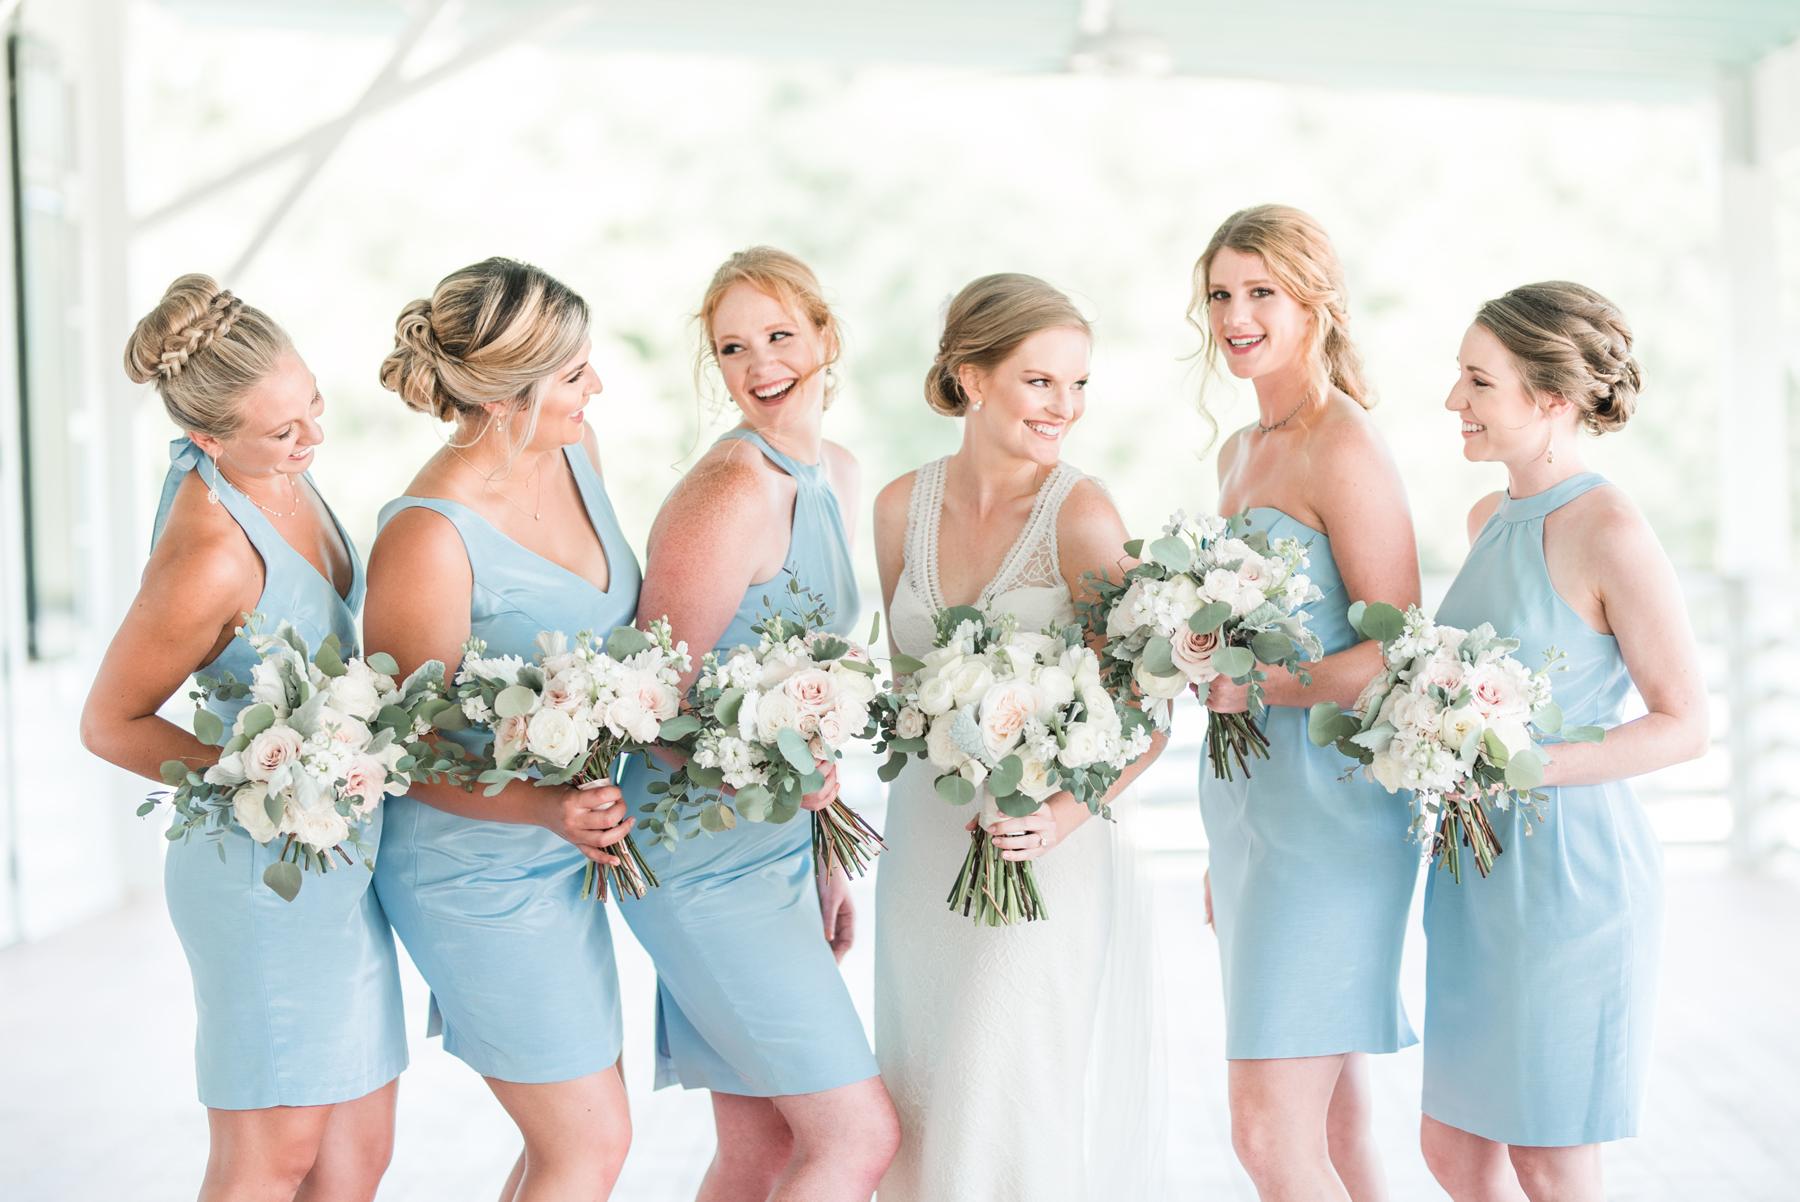 Blue Lula Kate Bridesmaids Dresses